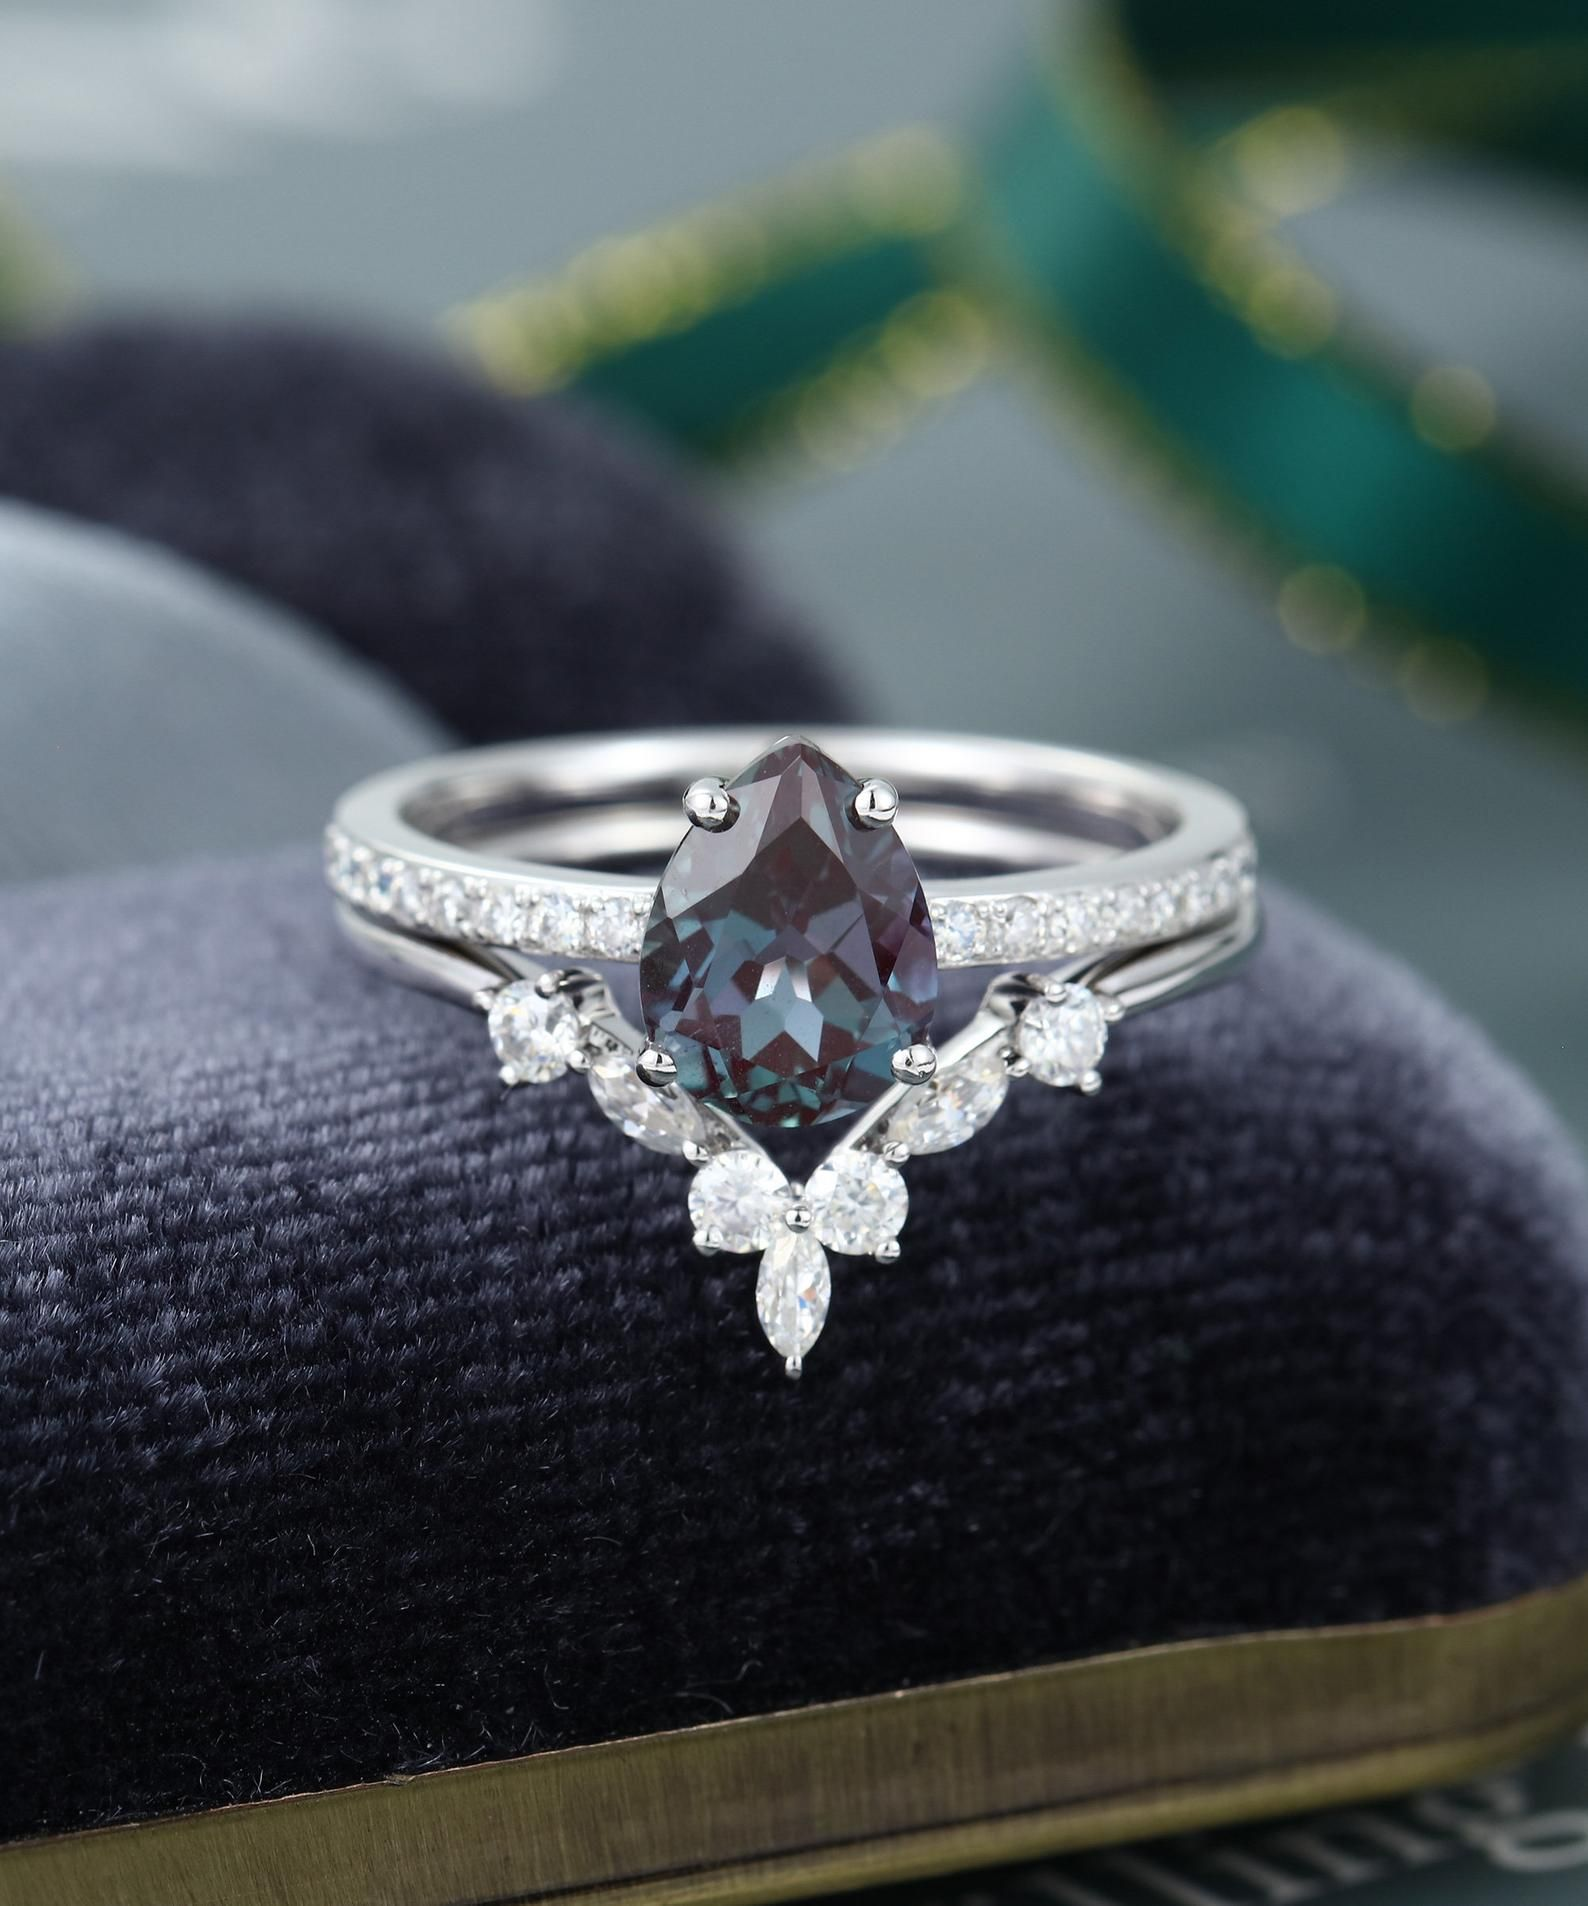 2pcs pear shaped alexandrite engagement ring set vintage